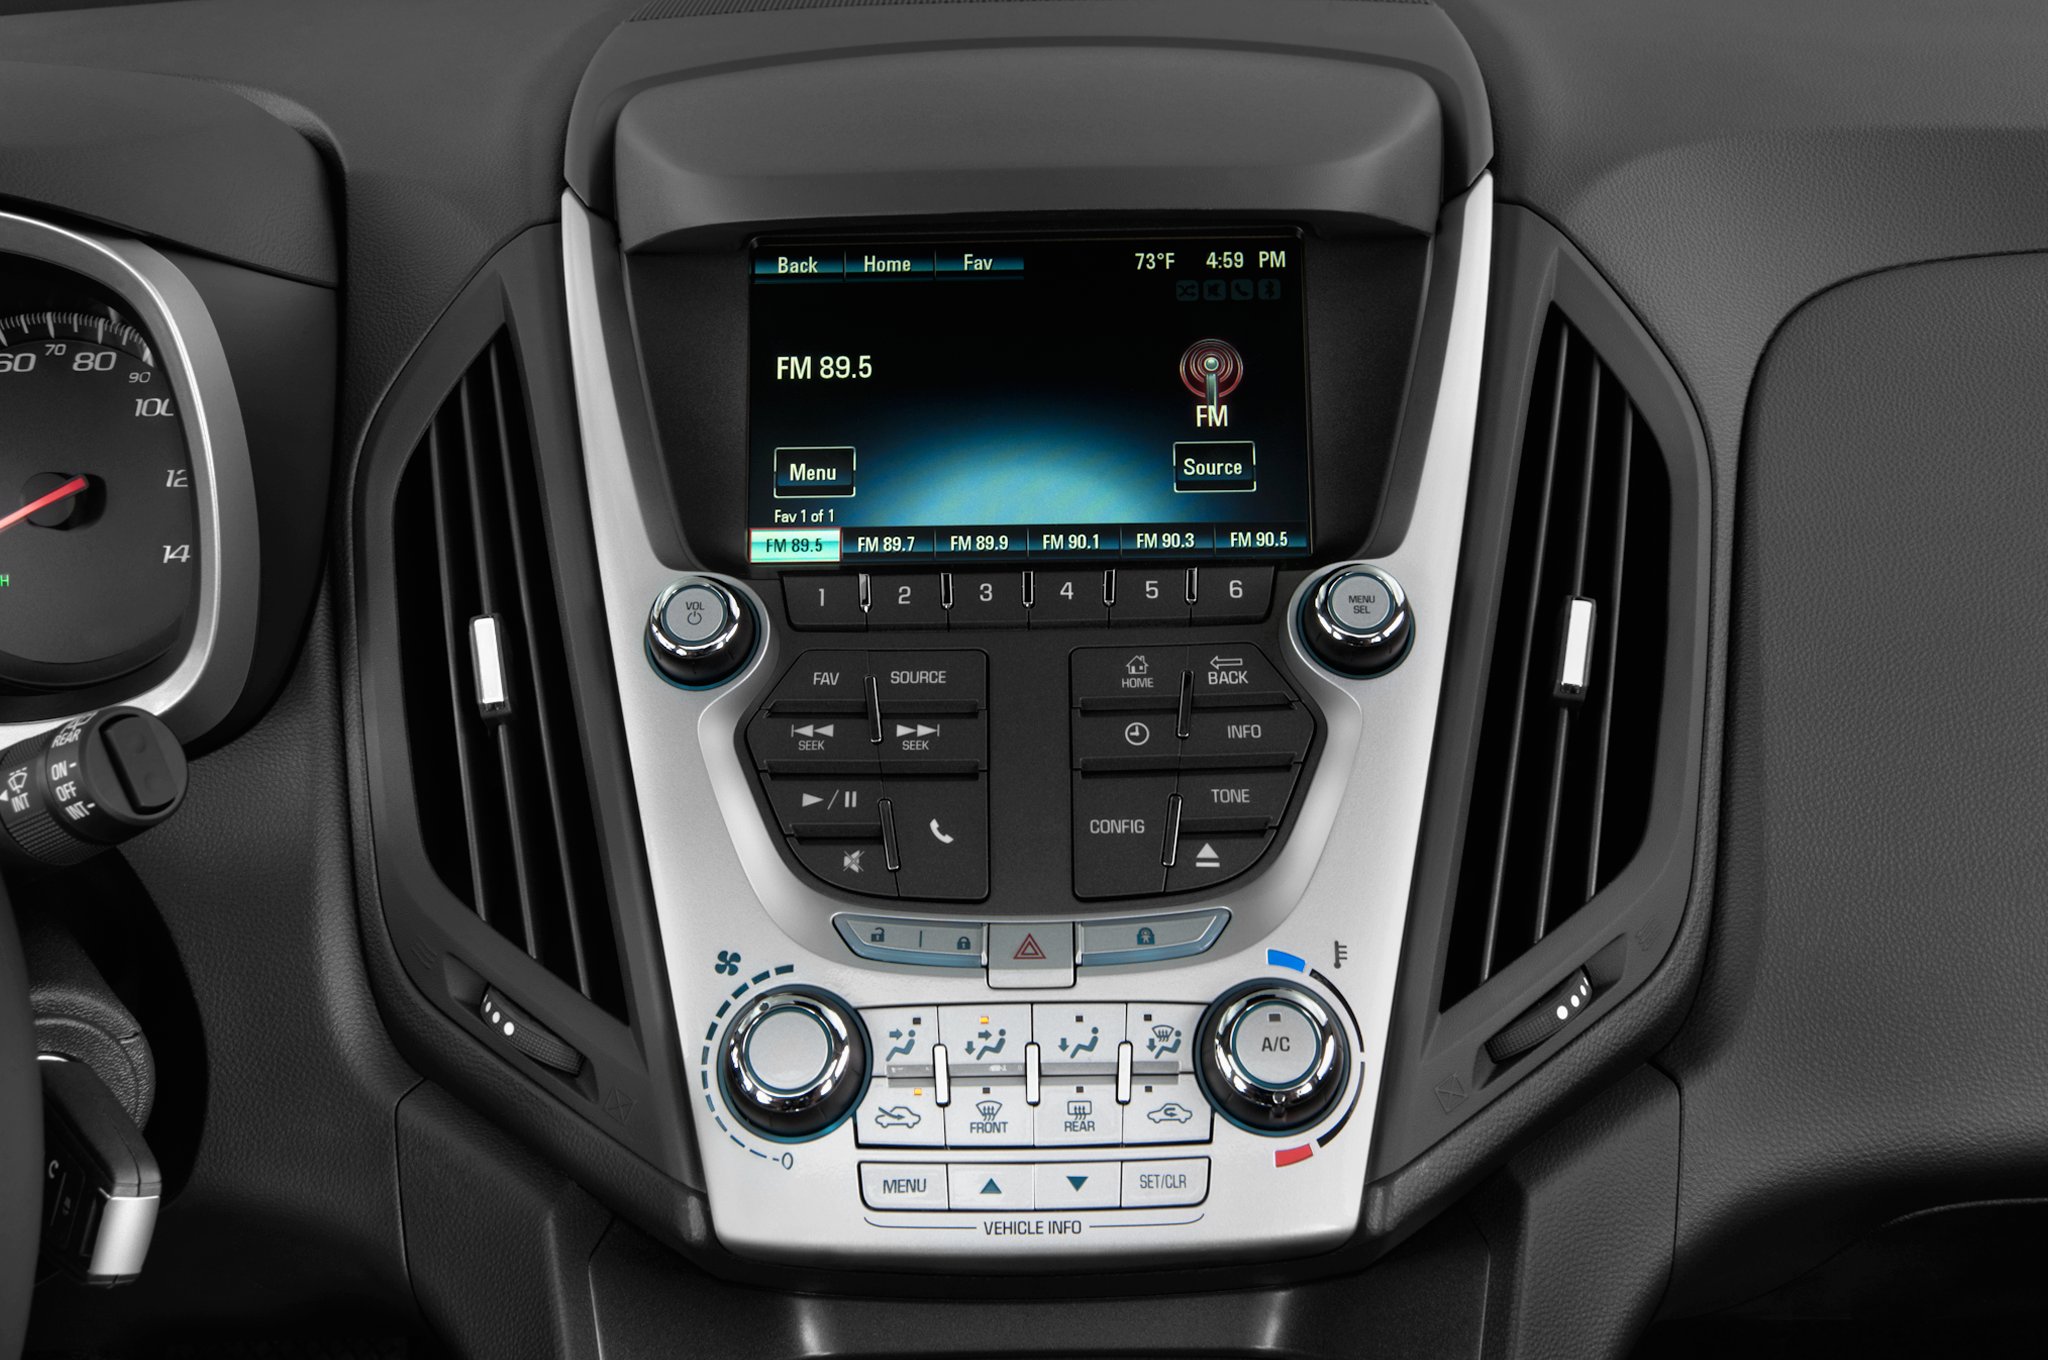 2012 Chevrolet Equinox Gains Mylink Crash Avoidance System 2015 Cruze Stereo Wire Diagram 27 32